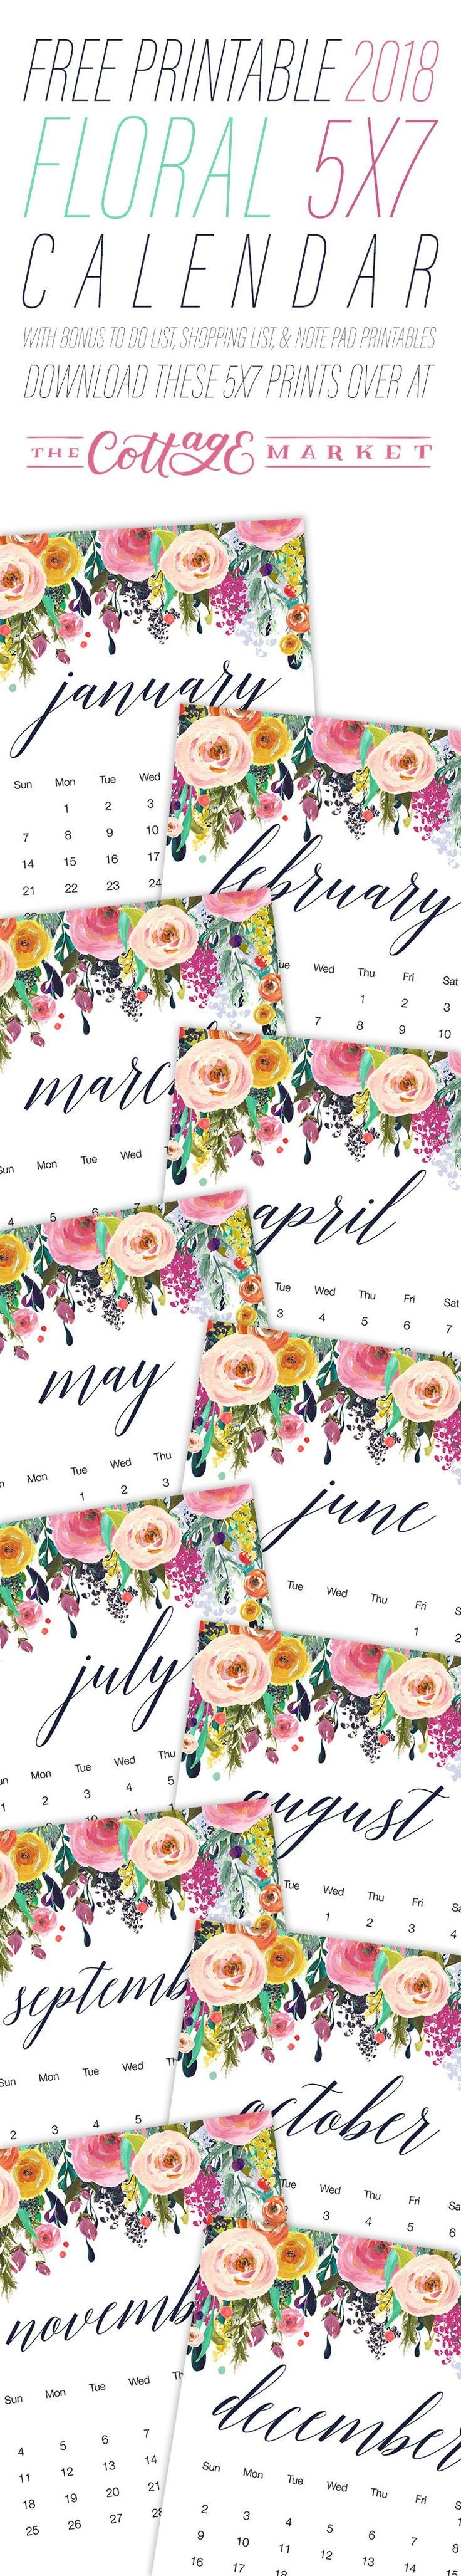 Free Printable 2018 Floral 5—7 Calendar